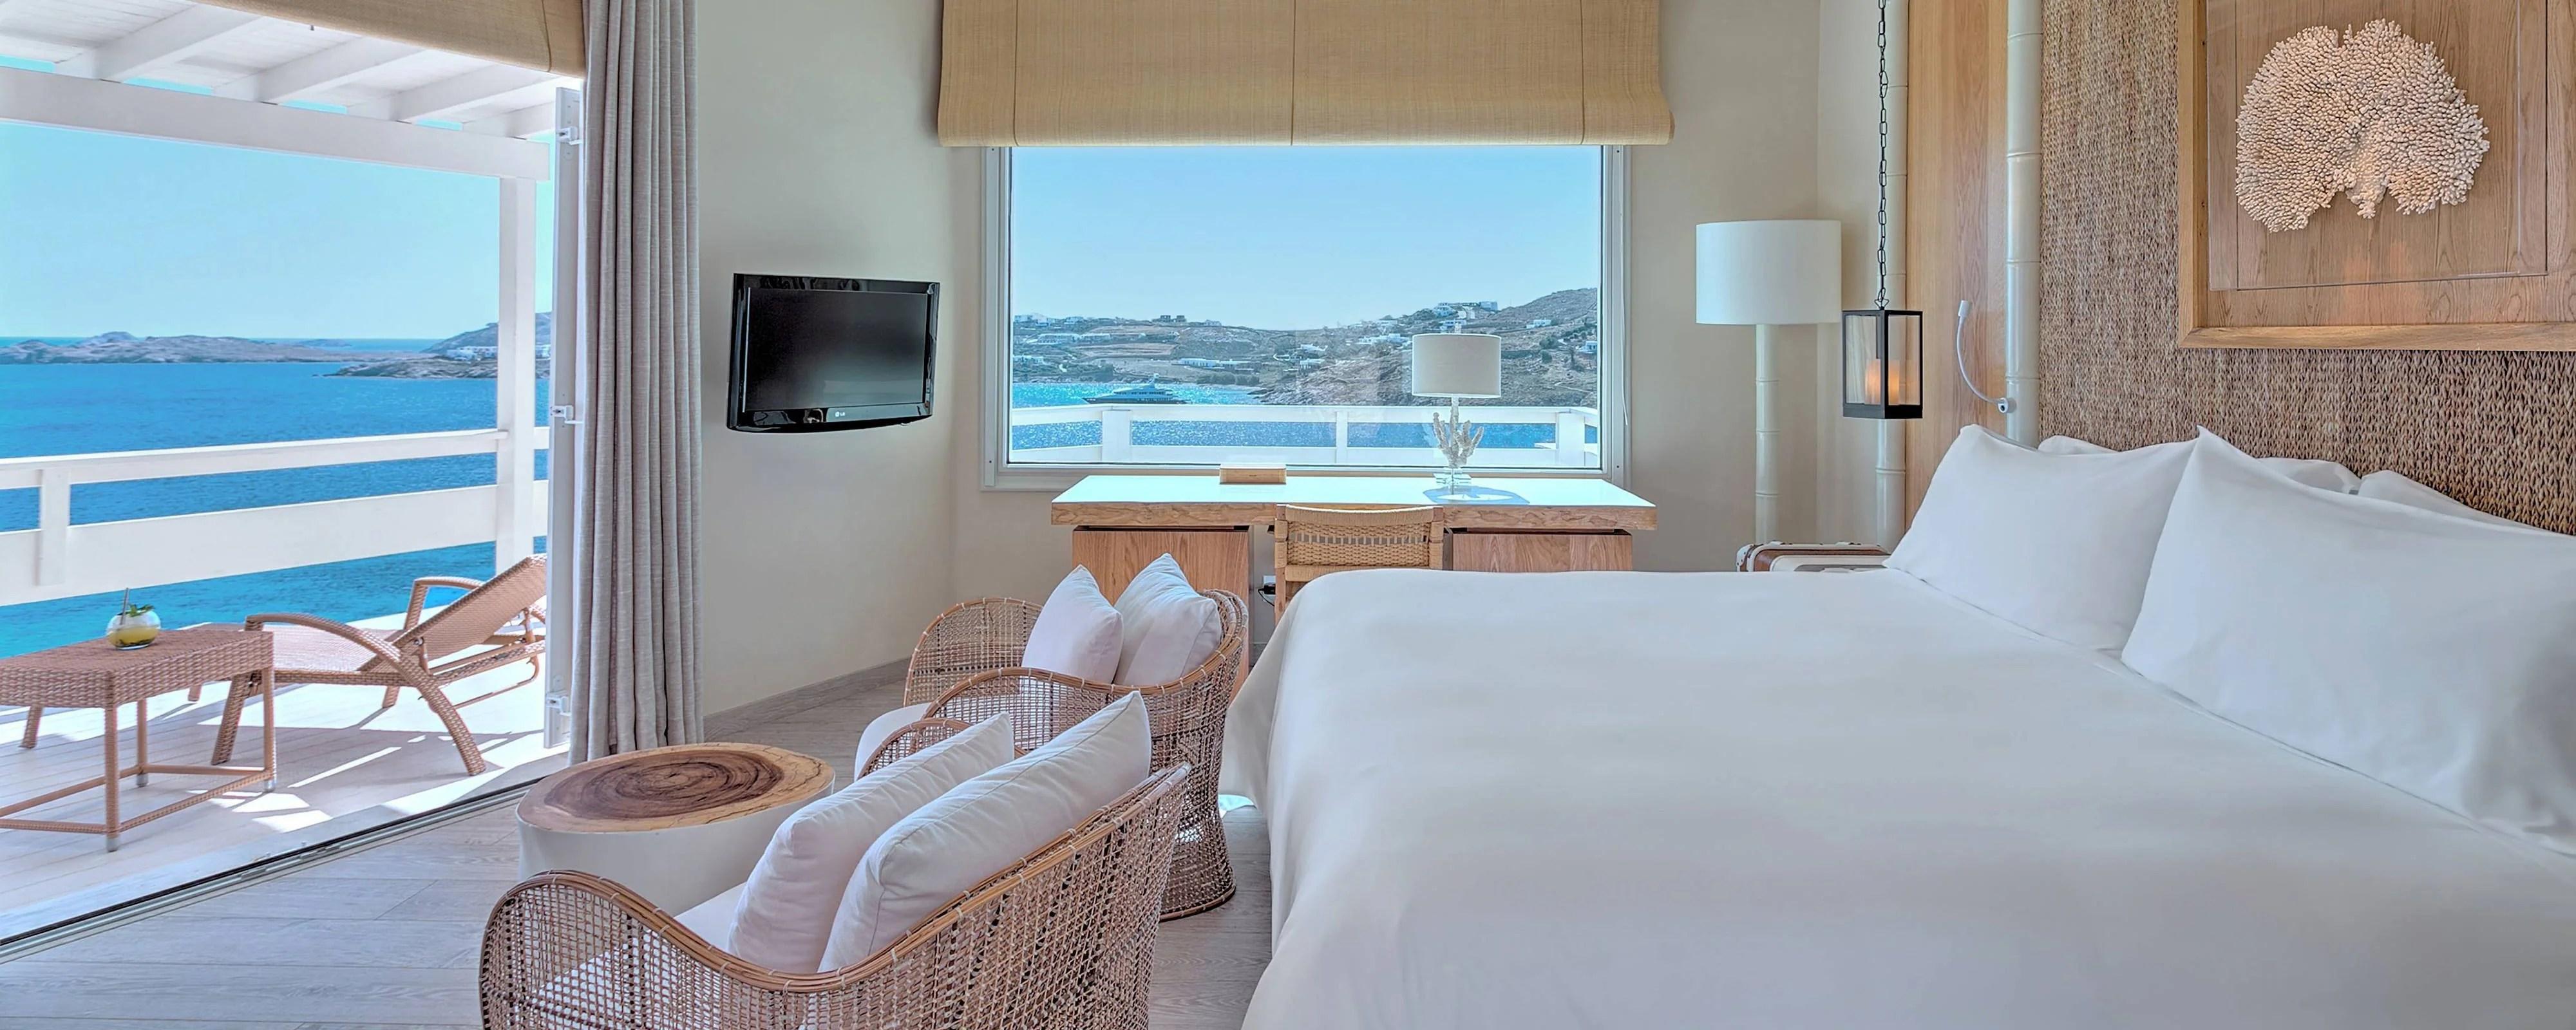 luxushotels in mykonos santa marina